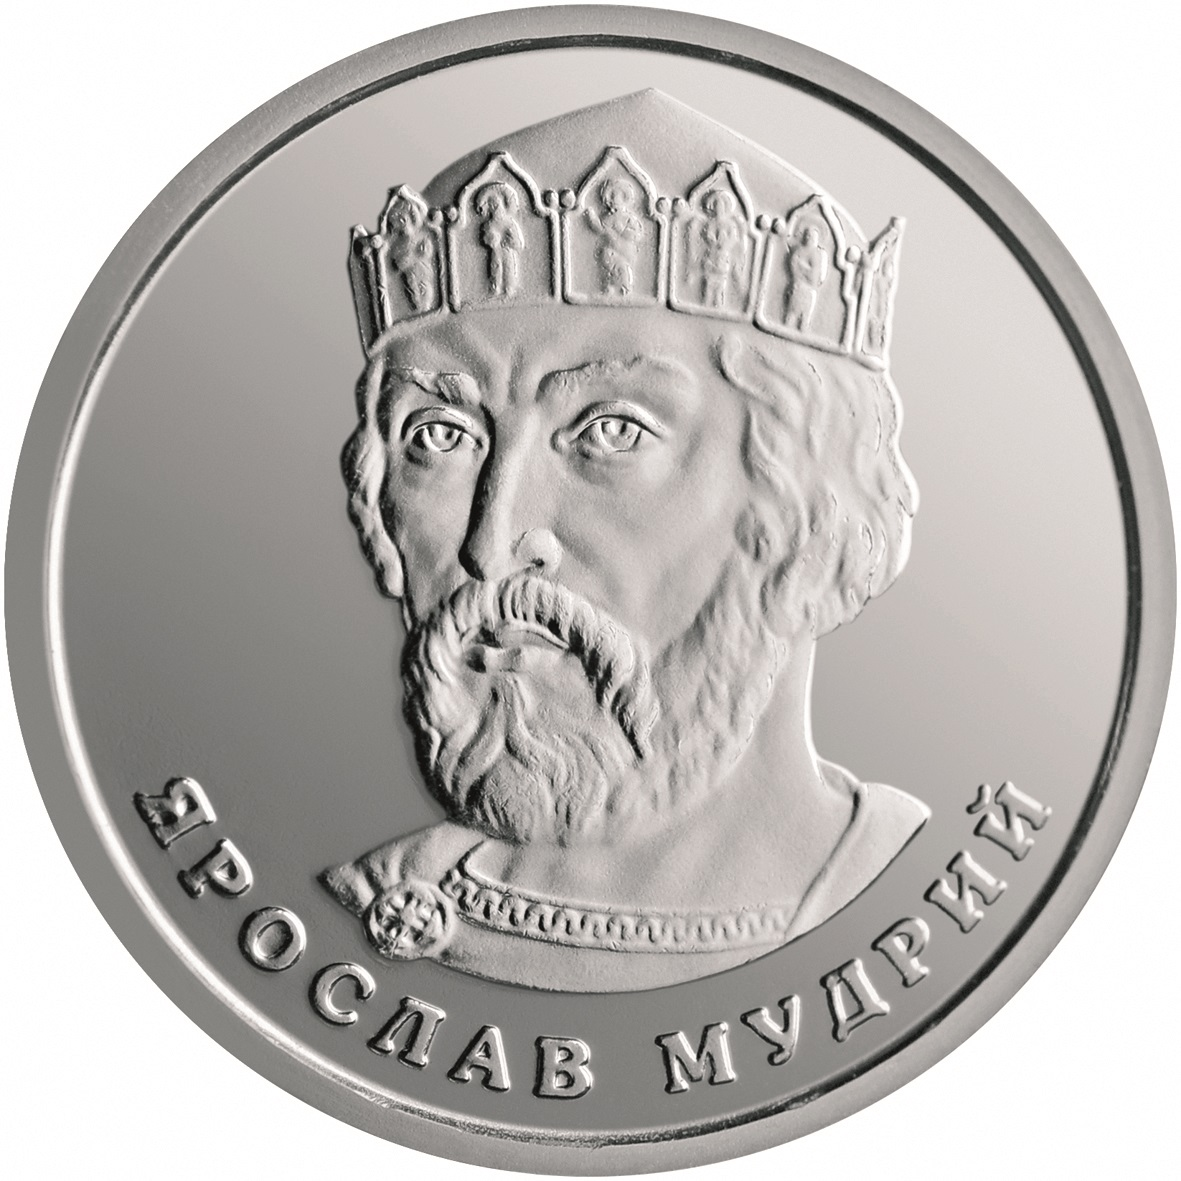 2018 #25 Ukraine Coin 2 UAH Hryvnia Oleksiy Kolomiychenko Олексій Коломійченко